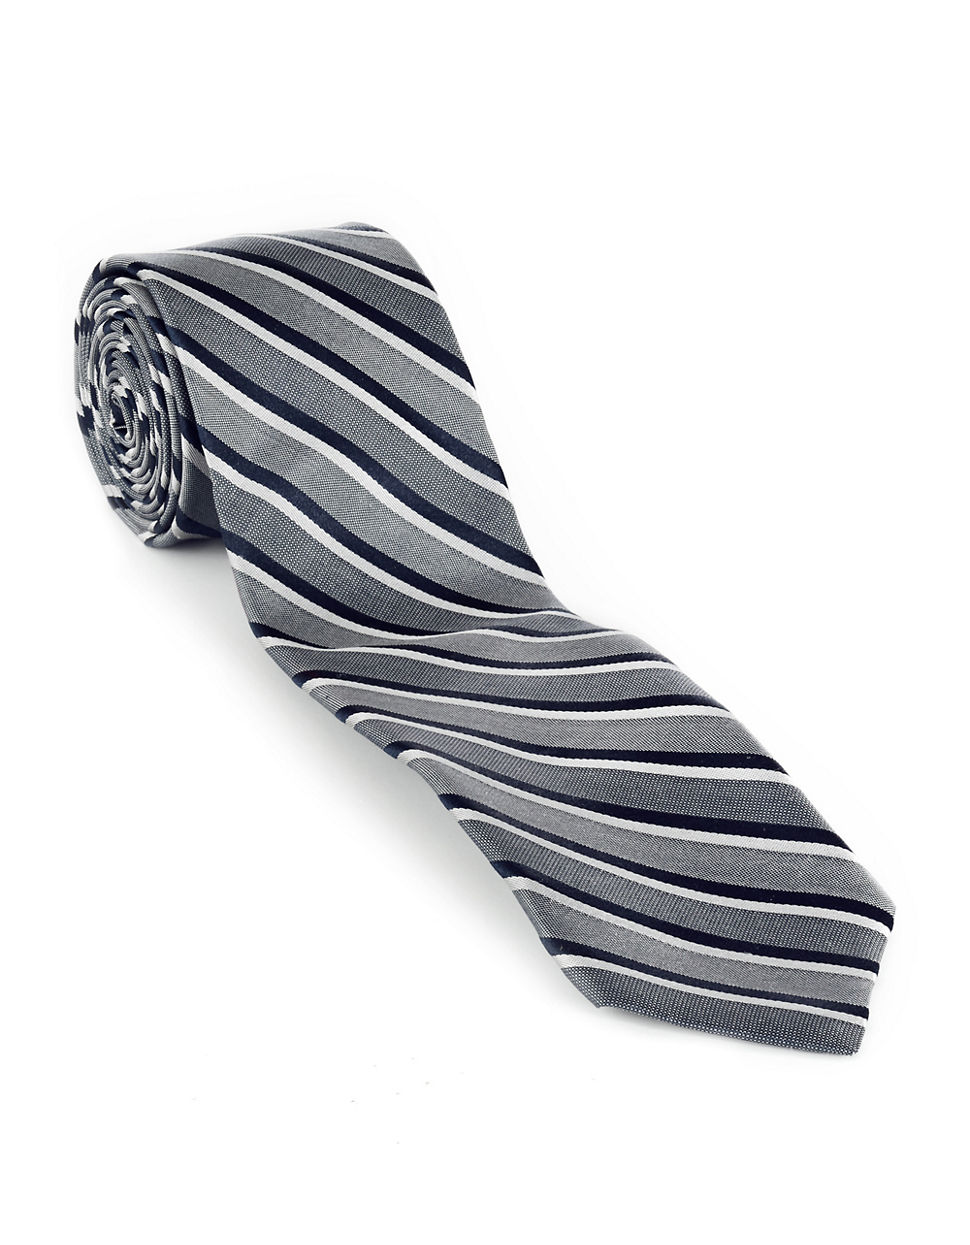 Striped Slim Tie charcoal One Size